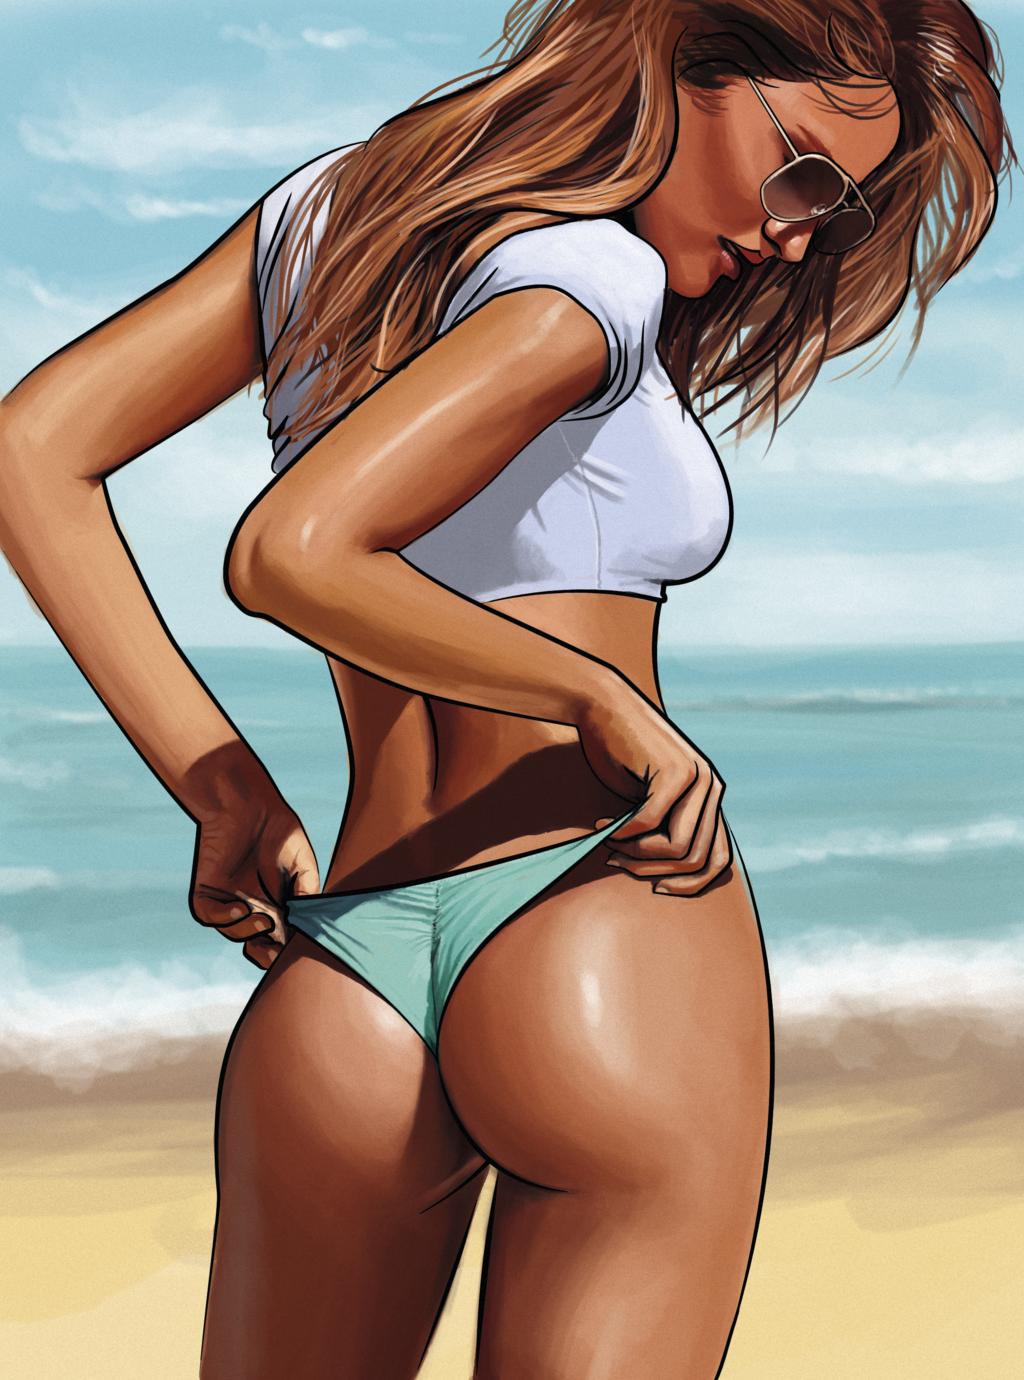 Gta sexy girls